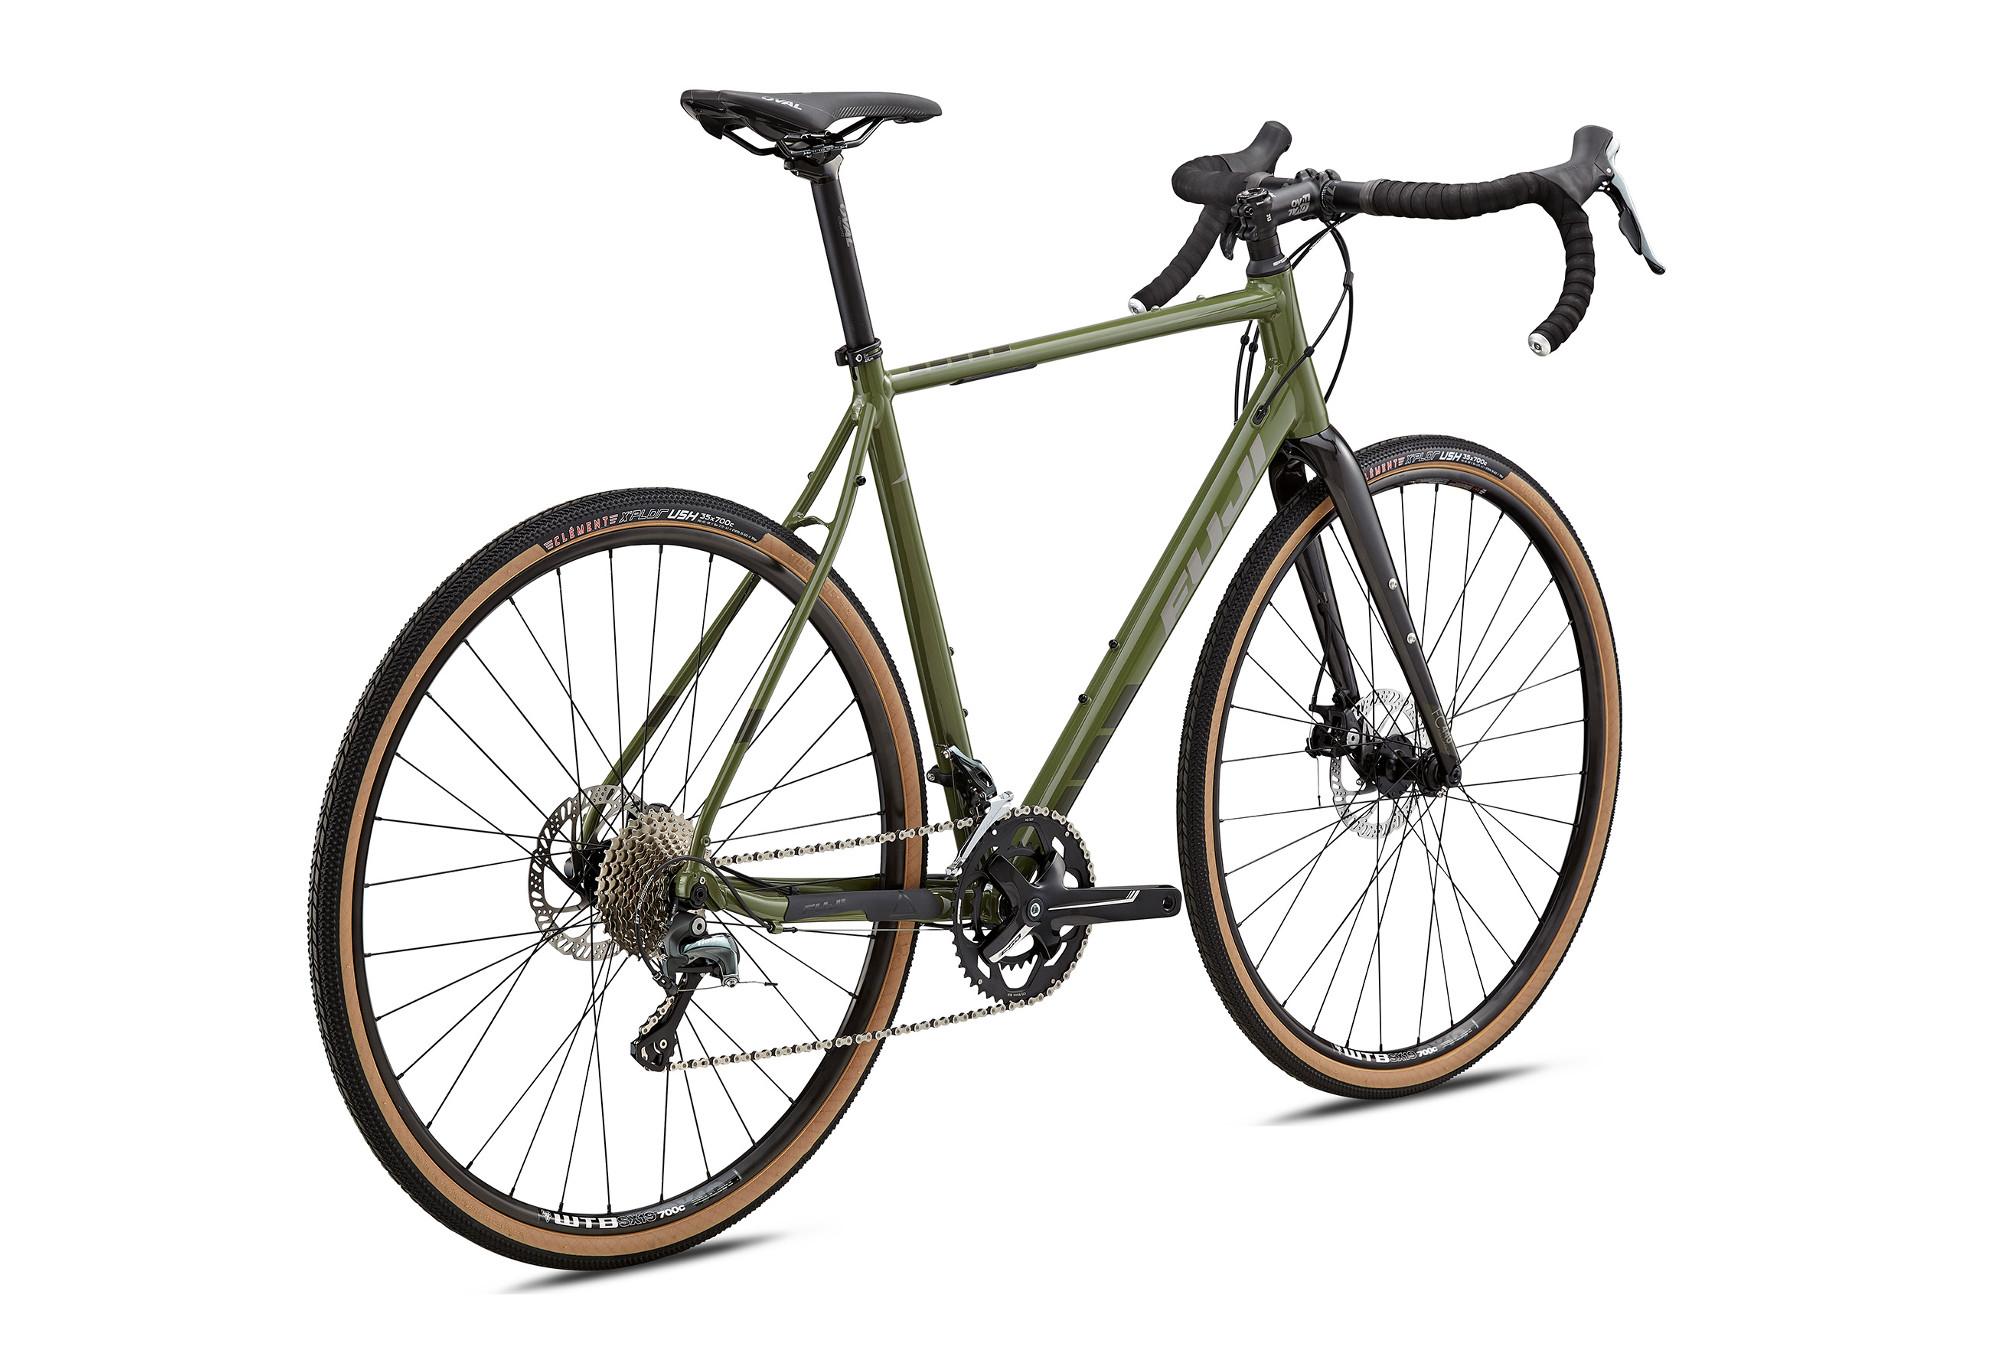 gravel bike fuji 2018 jari 1 7 shimano tiagra 10v olive. Black Bedroom Furniture Sets. Home Design Ideas